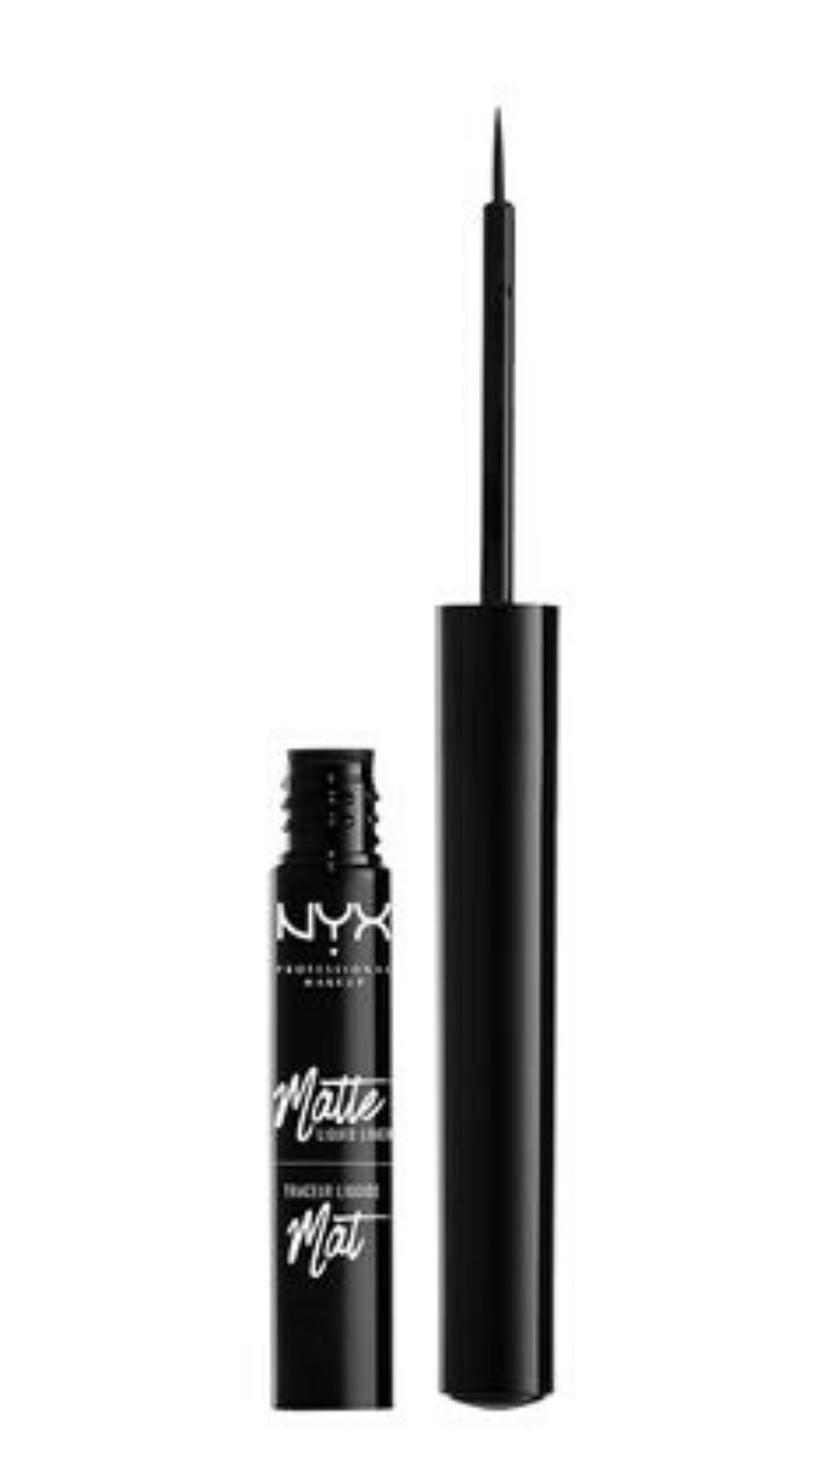 Eyeliner, Best Liquid Eyeliners, Smudge Proof eyeliners, Best Beauty finds